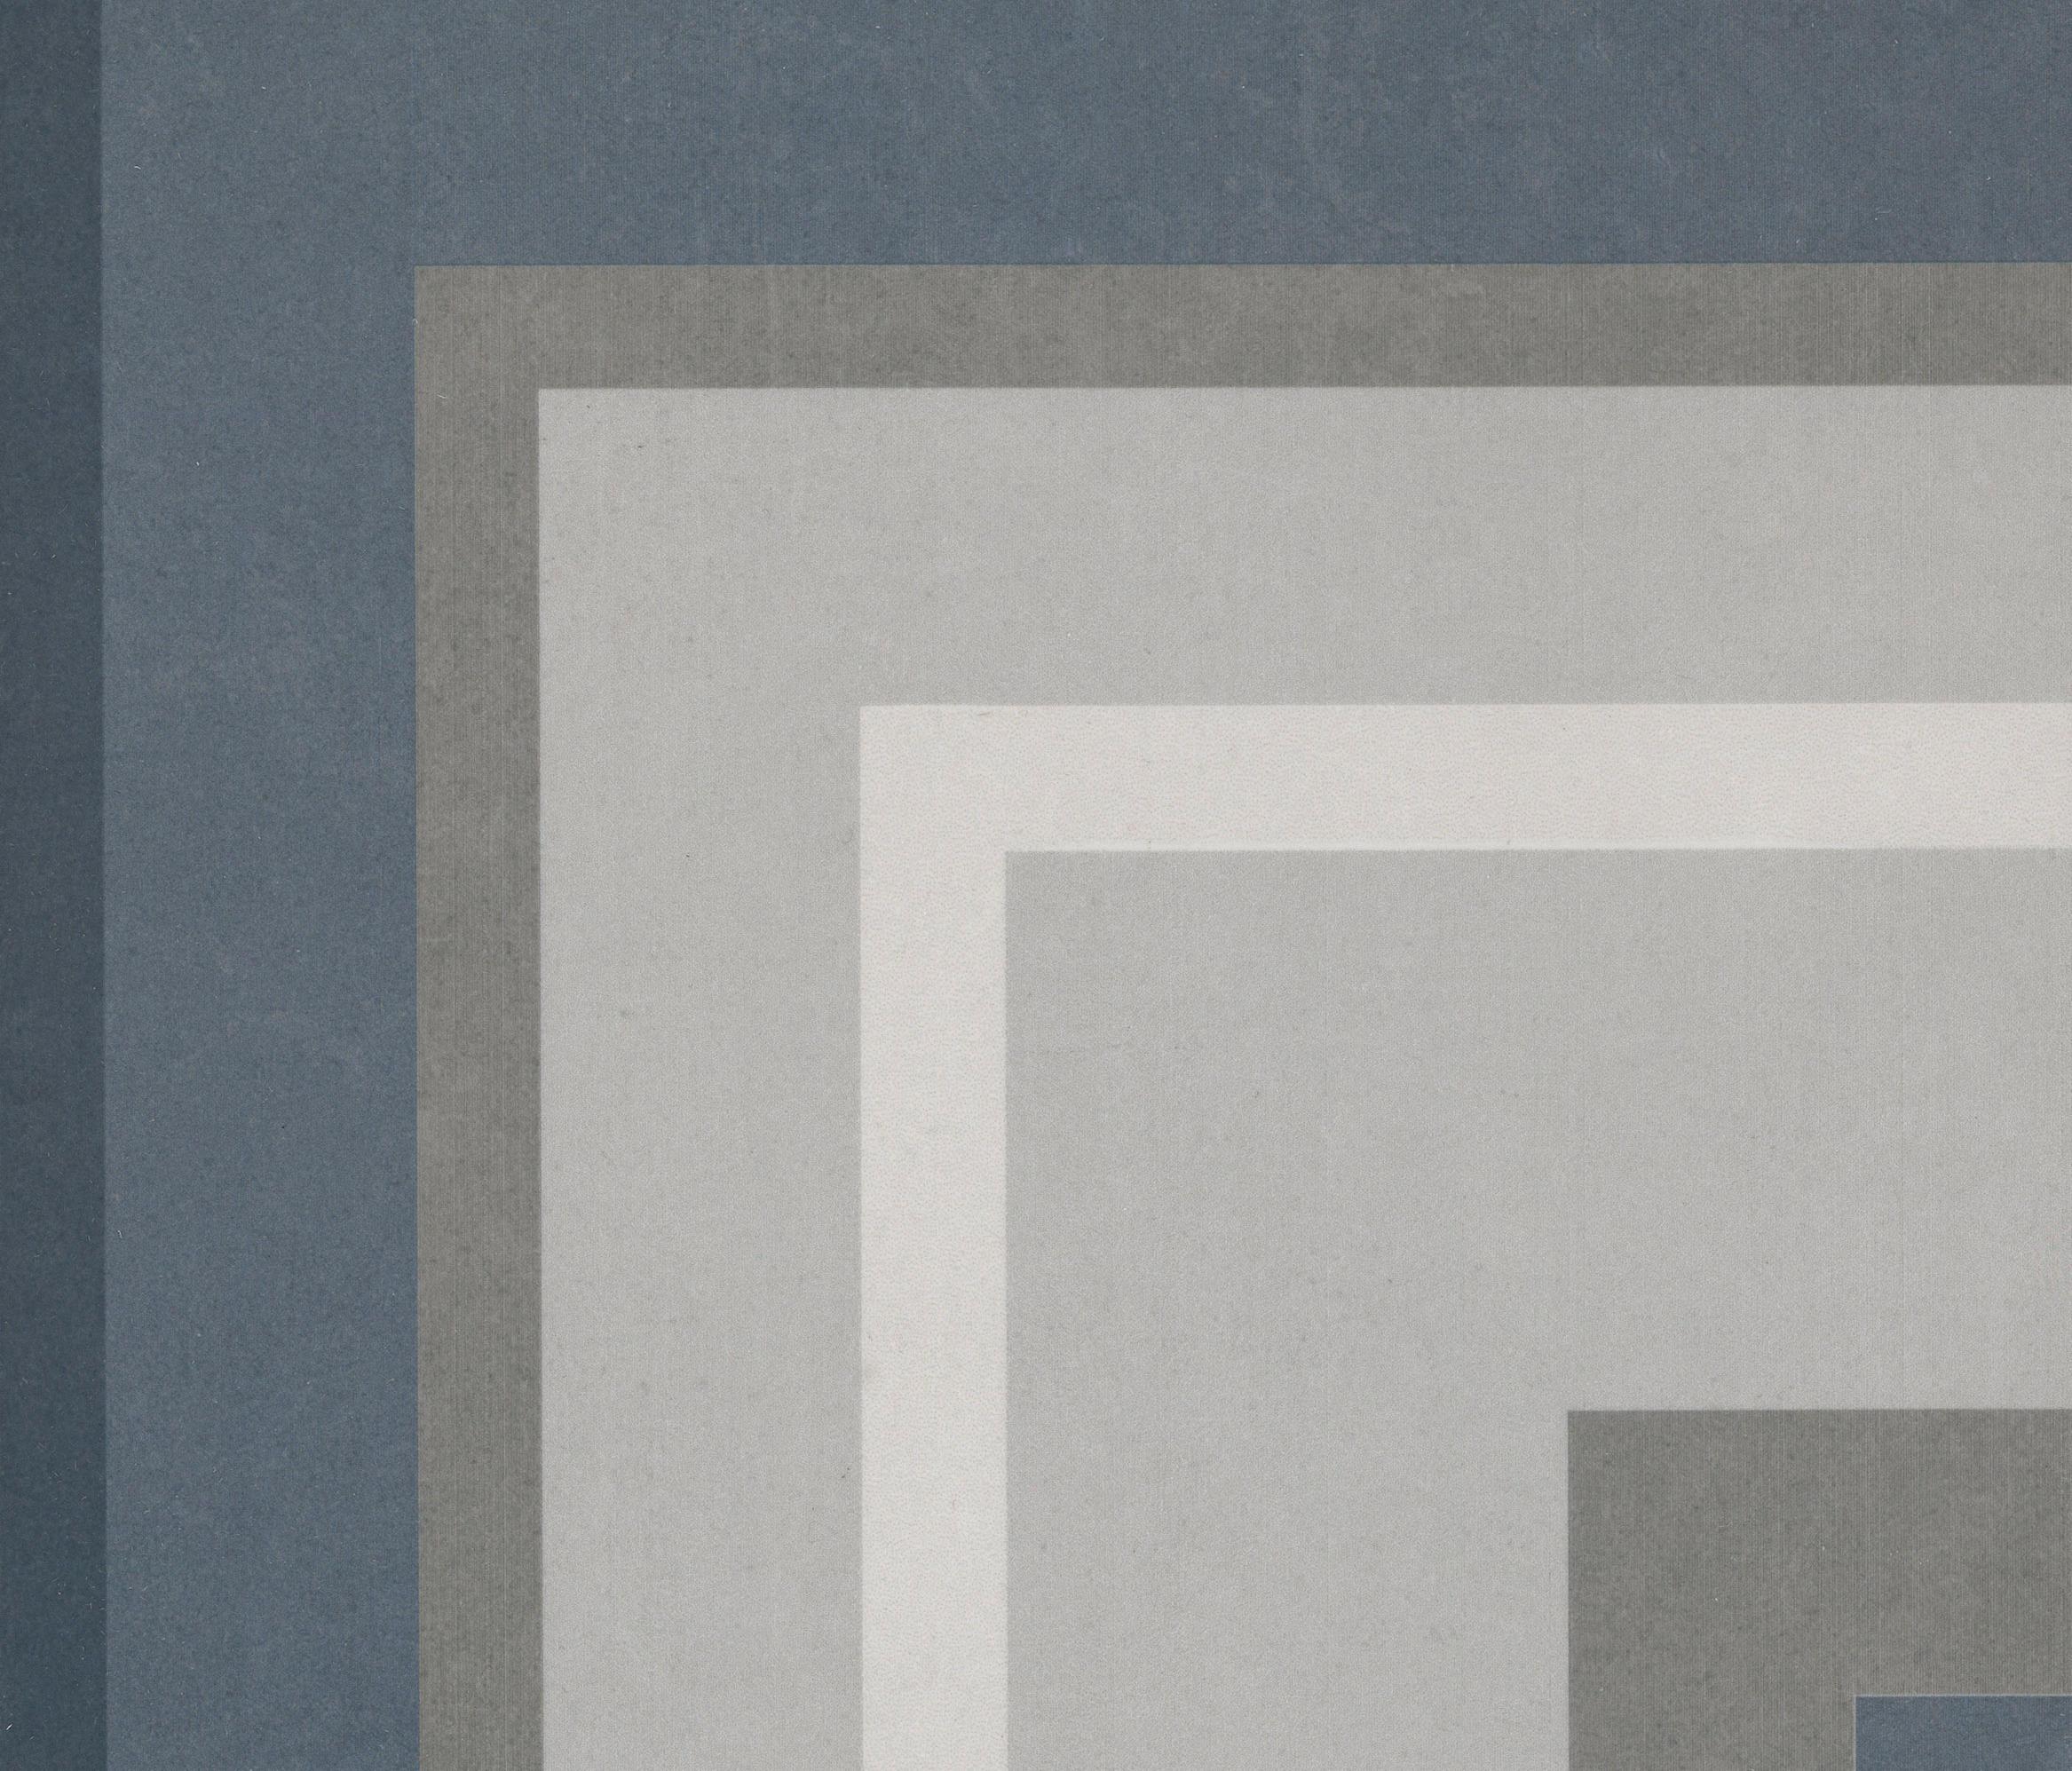 century unlimited cf6e tiles from villeroy boch fliesen architonic. Black Bedroom Furniture Sets. Home Design Ideas